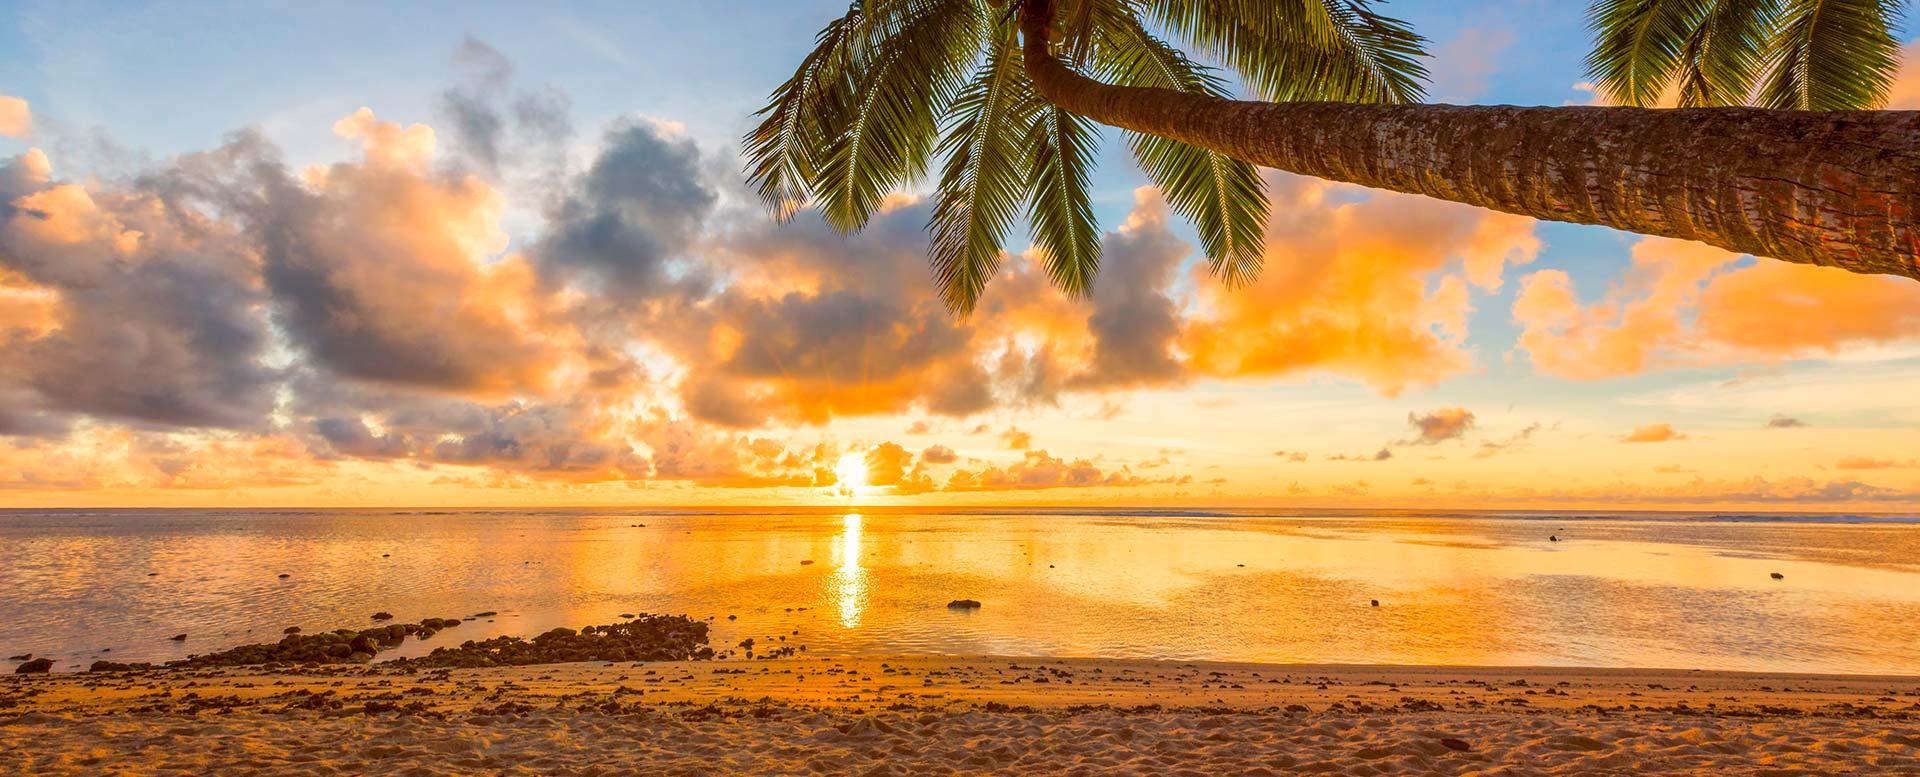 Flitterwochen-Ziel Cook-Inseln